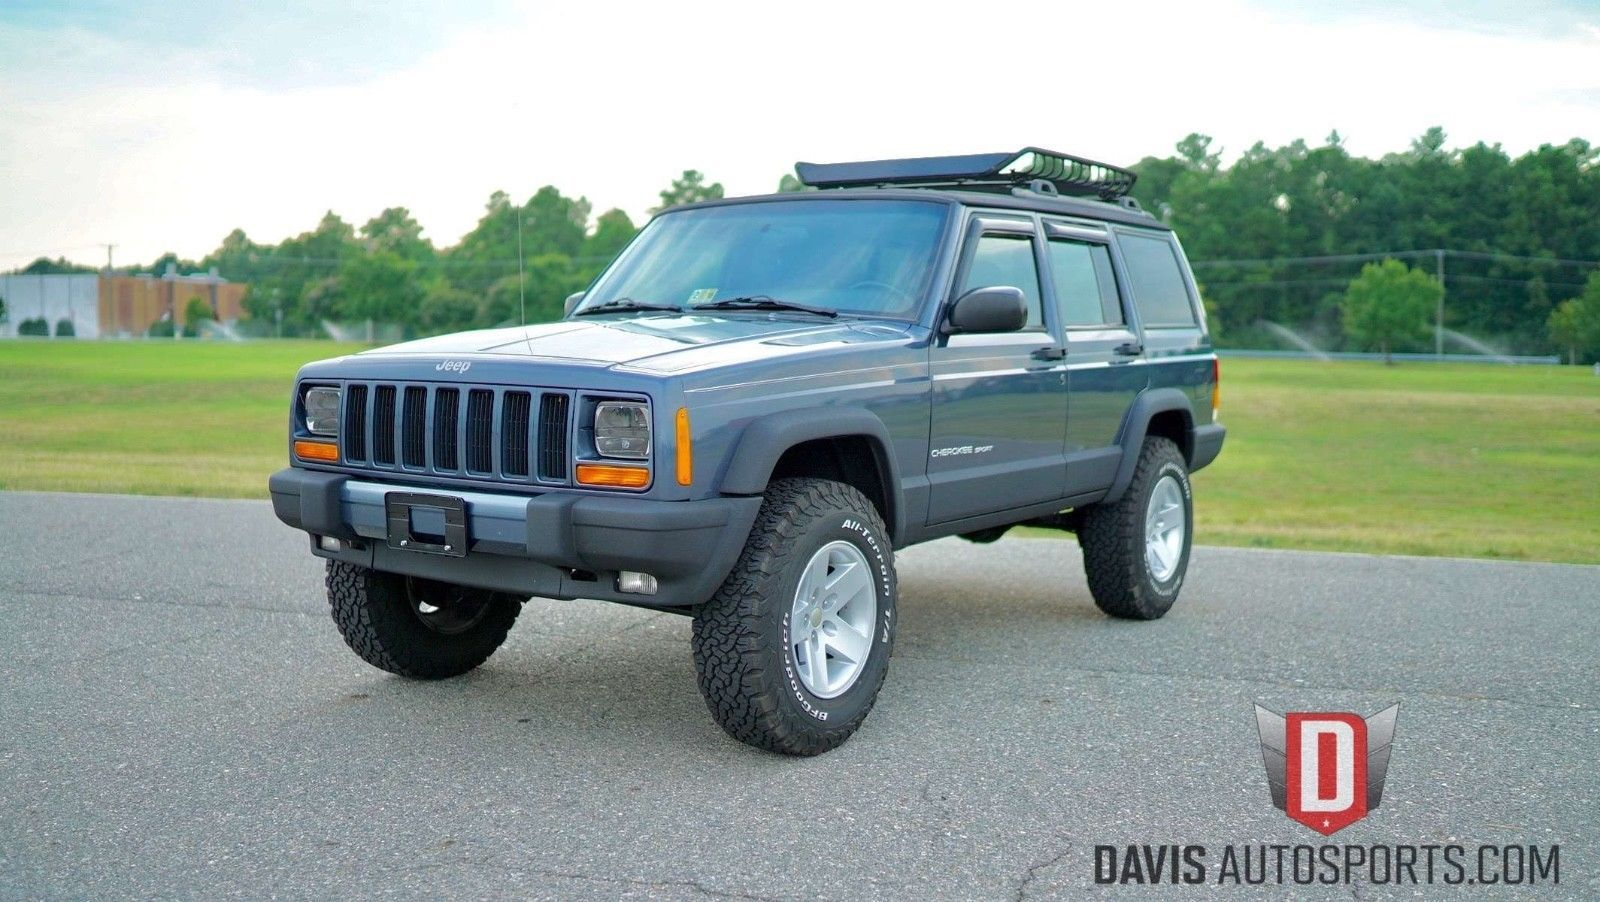 eBay 2001 Jeep Cherokee SPORT XJ 4X4 JEEP CHEROKEE XJ